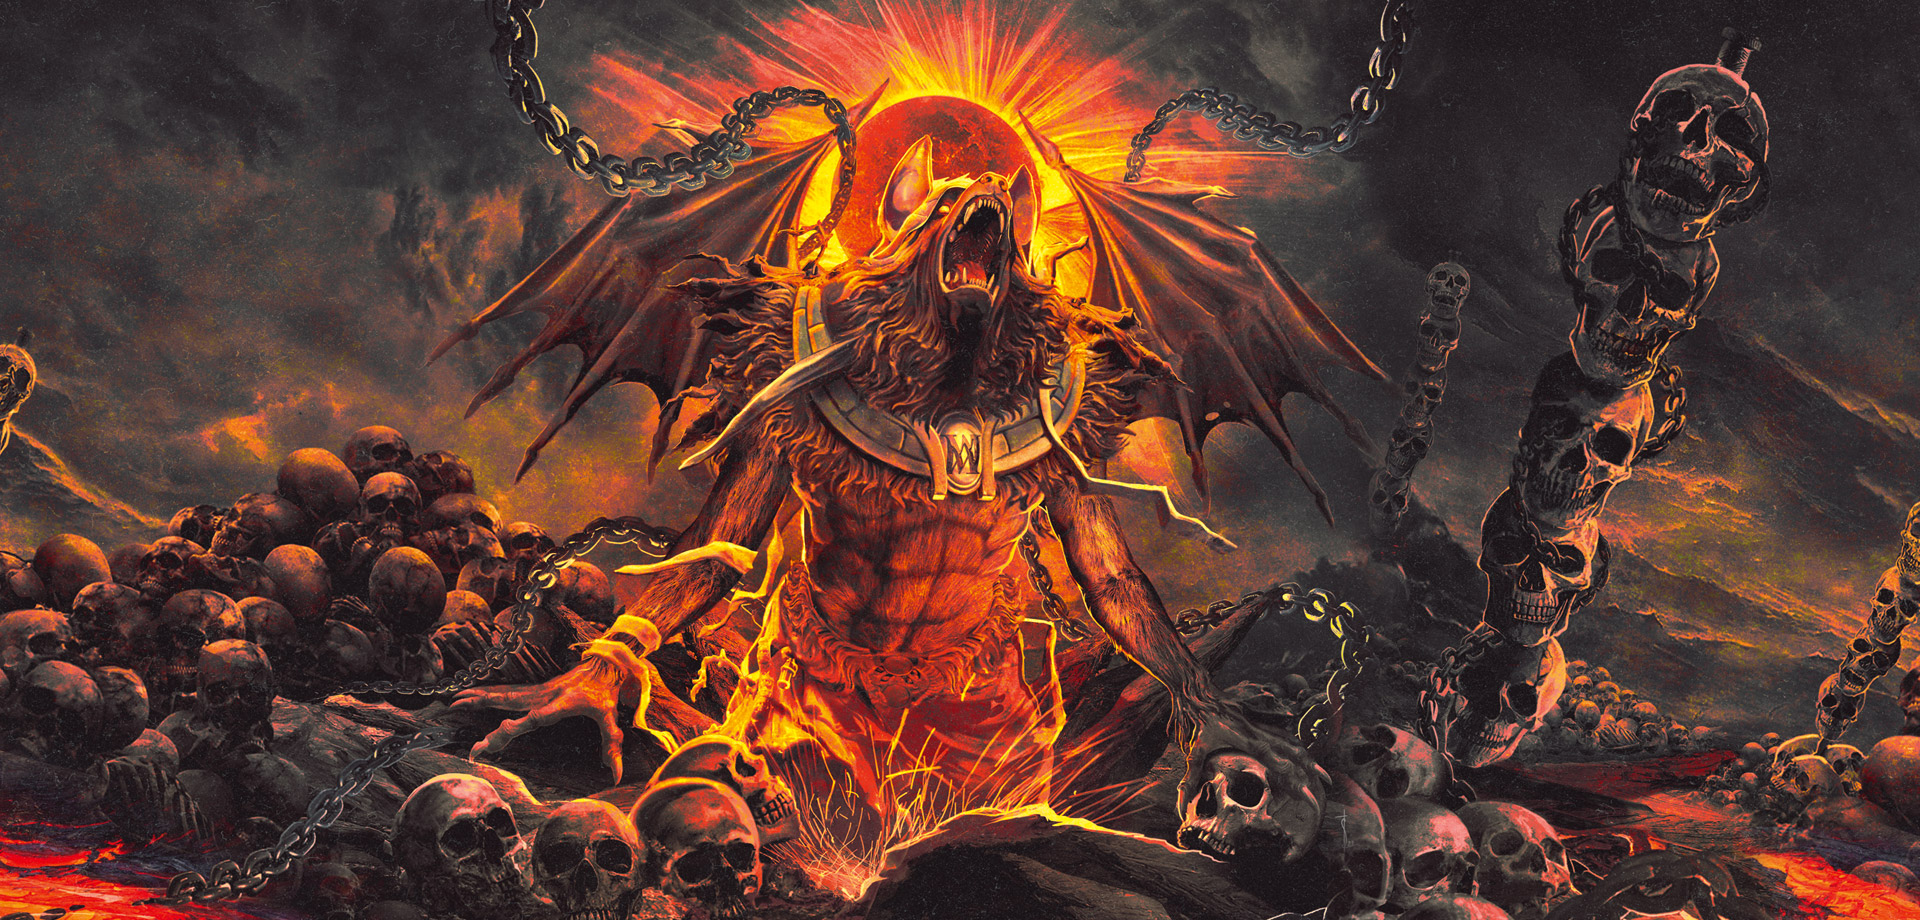 MANIMAL – Armageddon